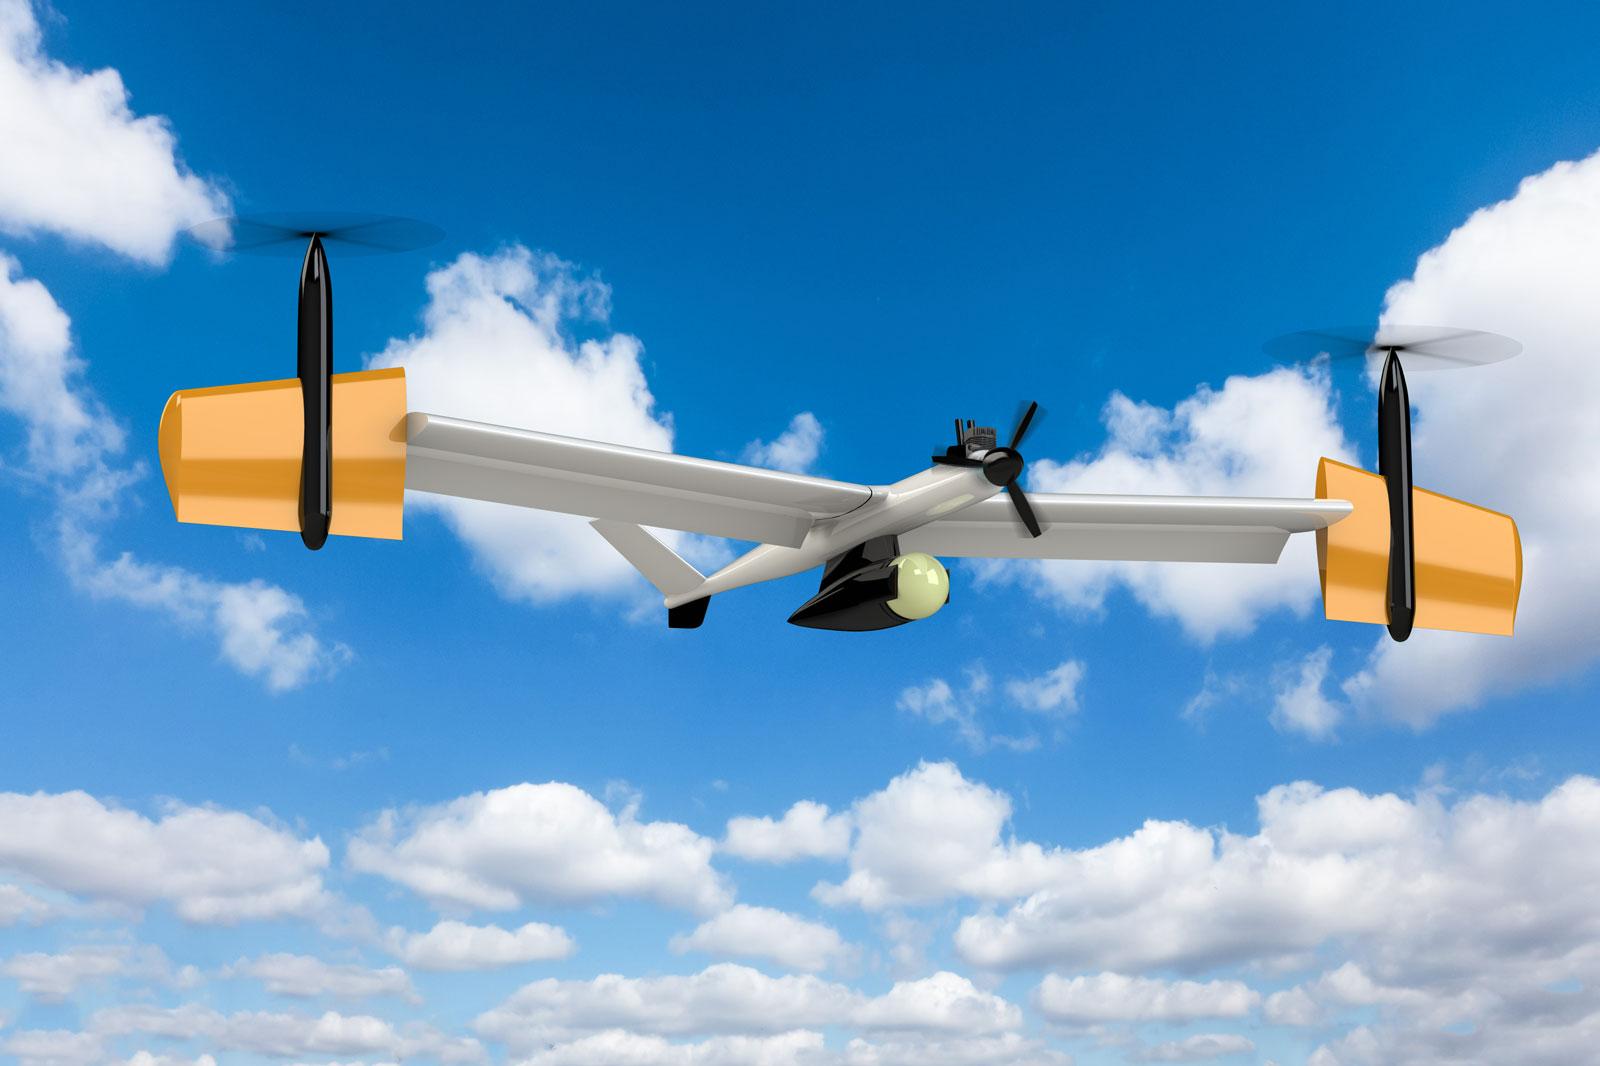 SkyBridge UAS VTOL SB-1